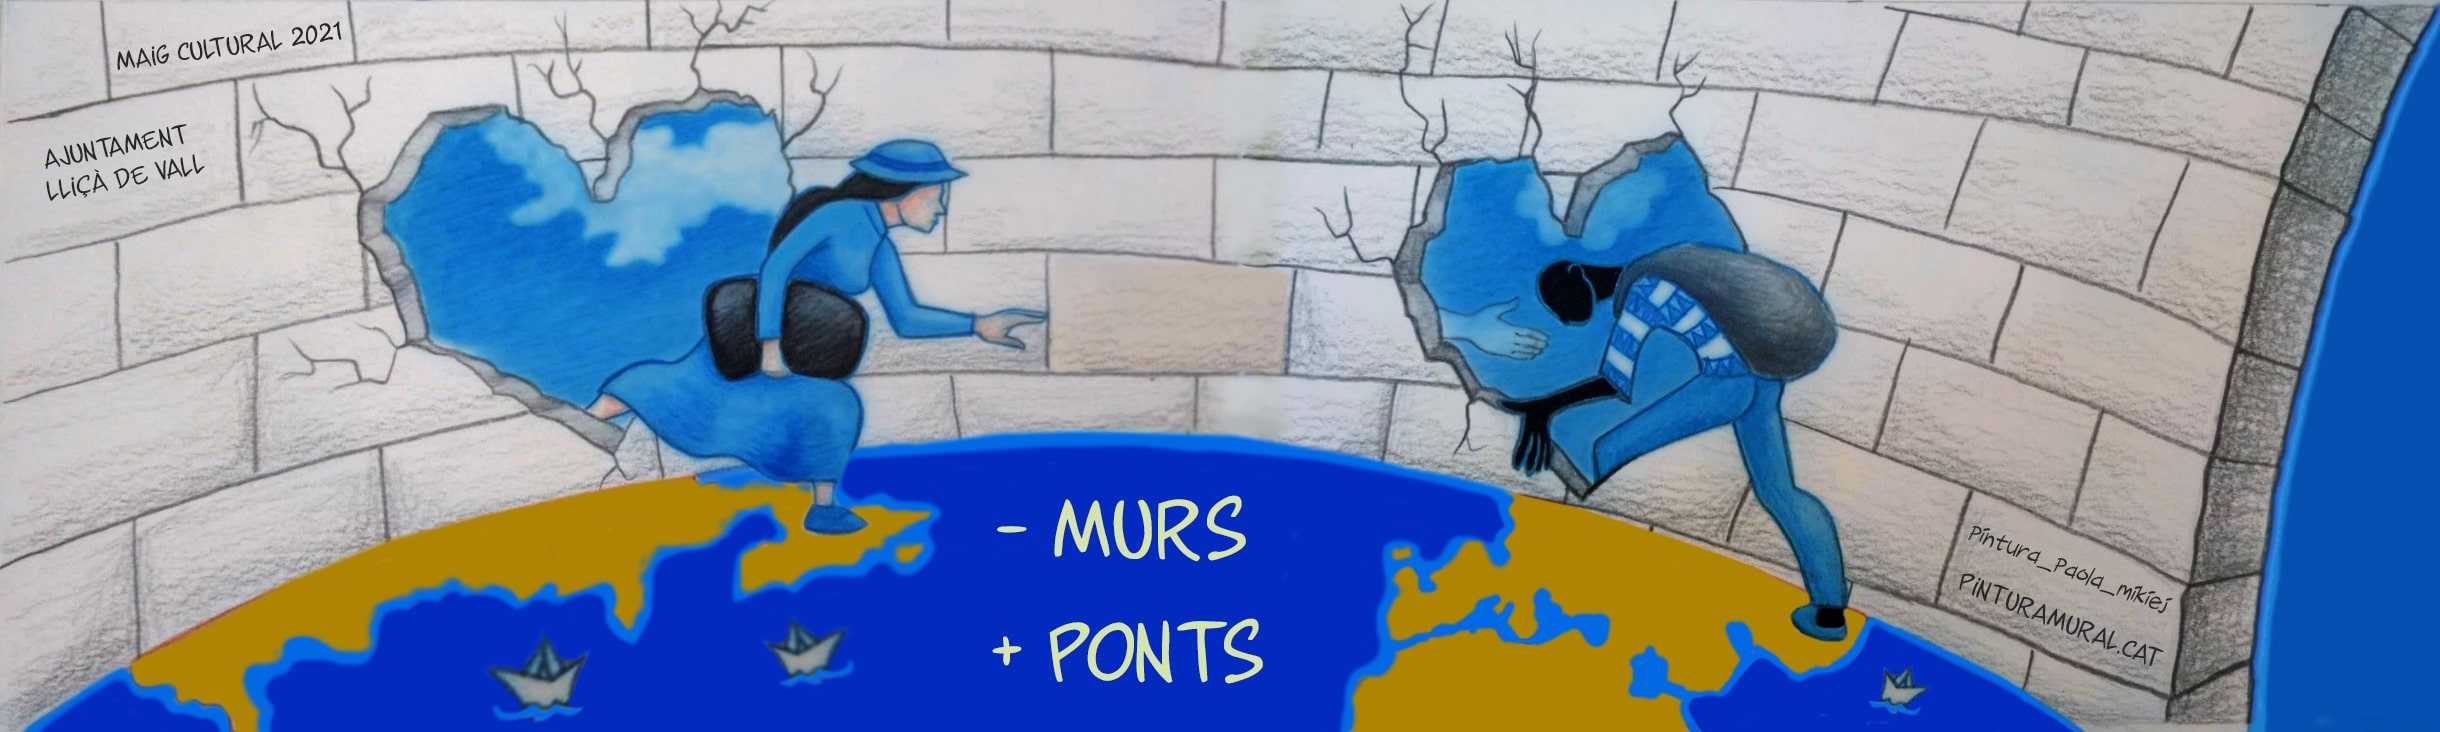 Boceto para el Taller de Pintura Mural: Inmigración, Lliçà de Vall